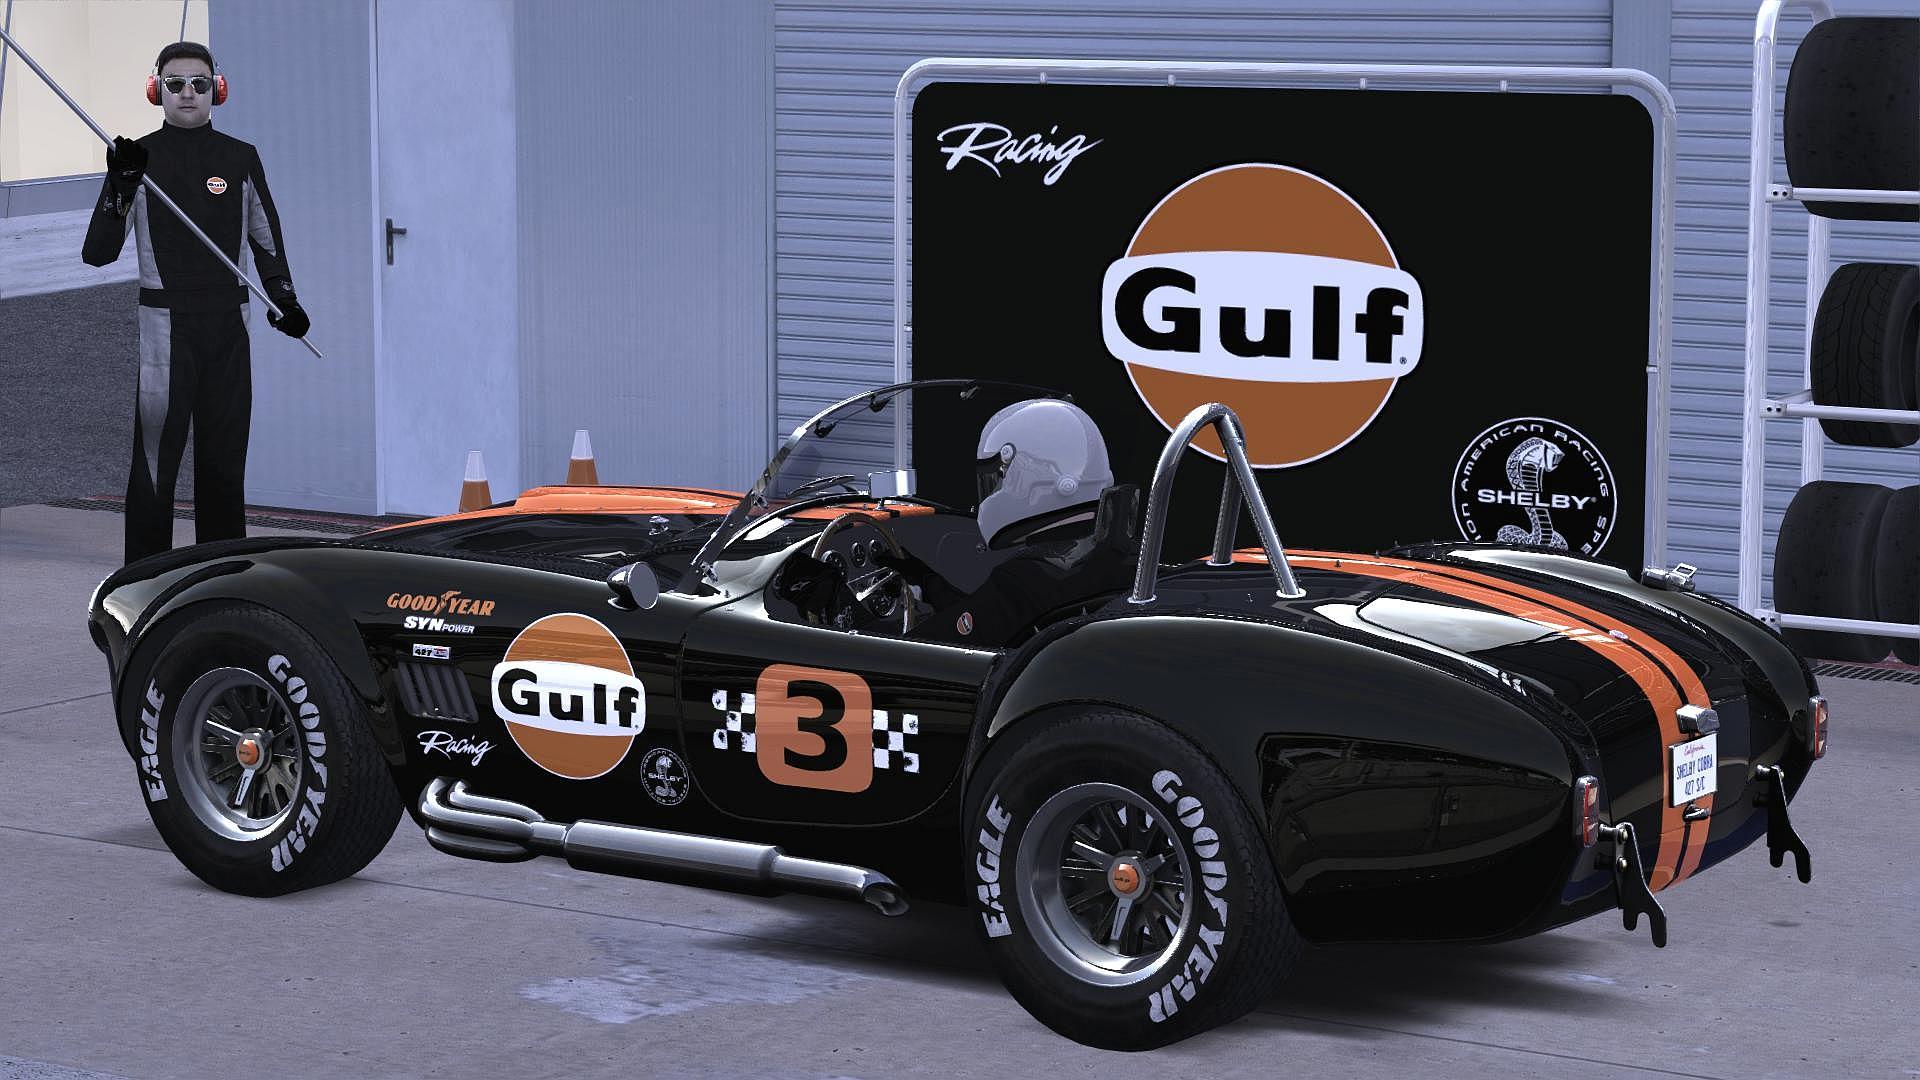 Cobra Gulf - Black edition